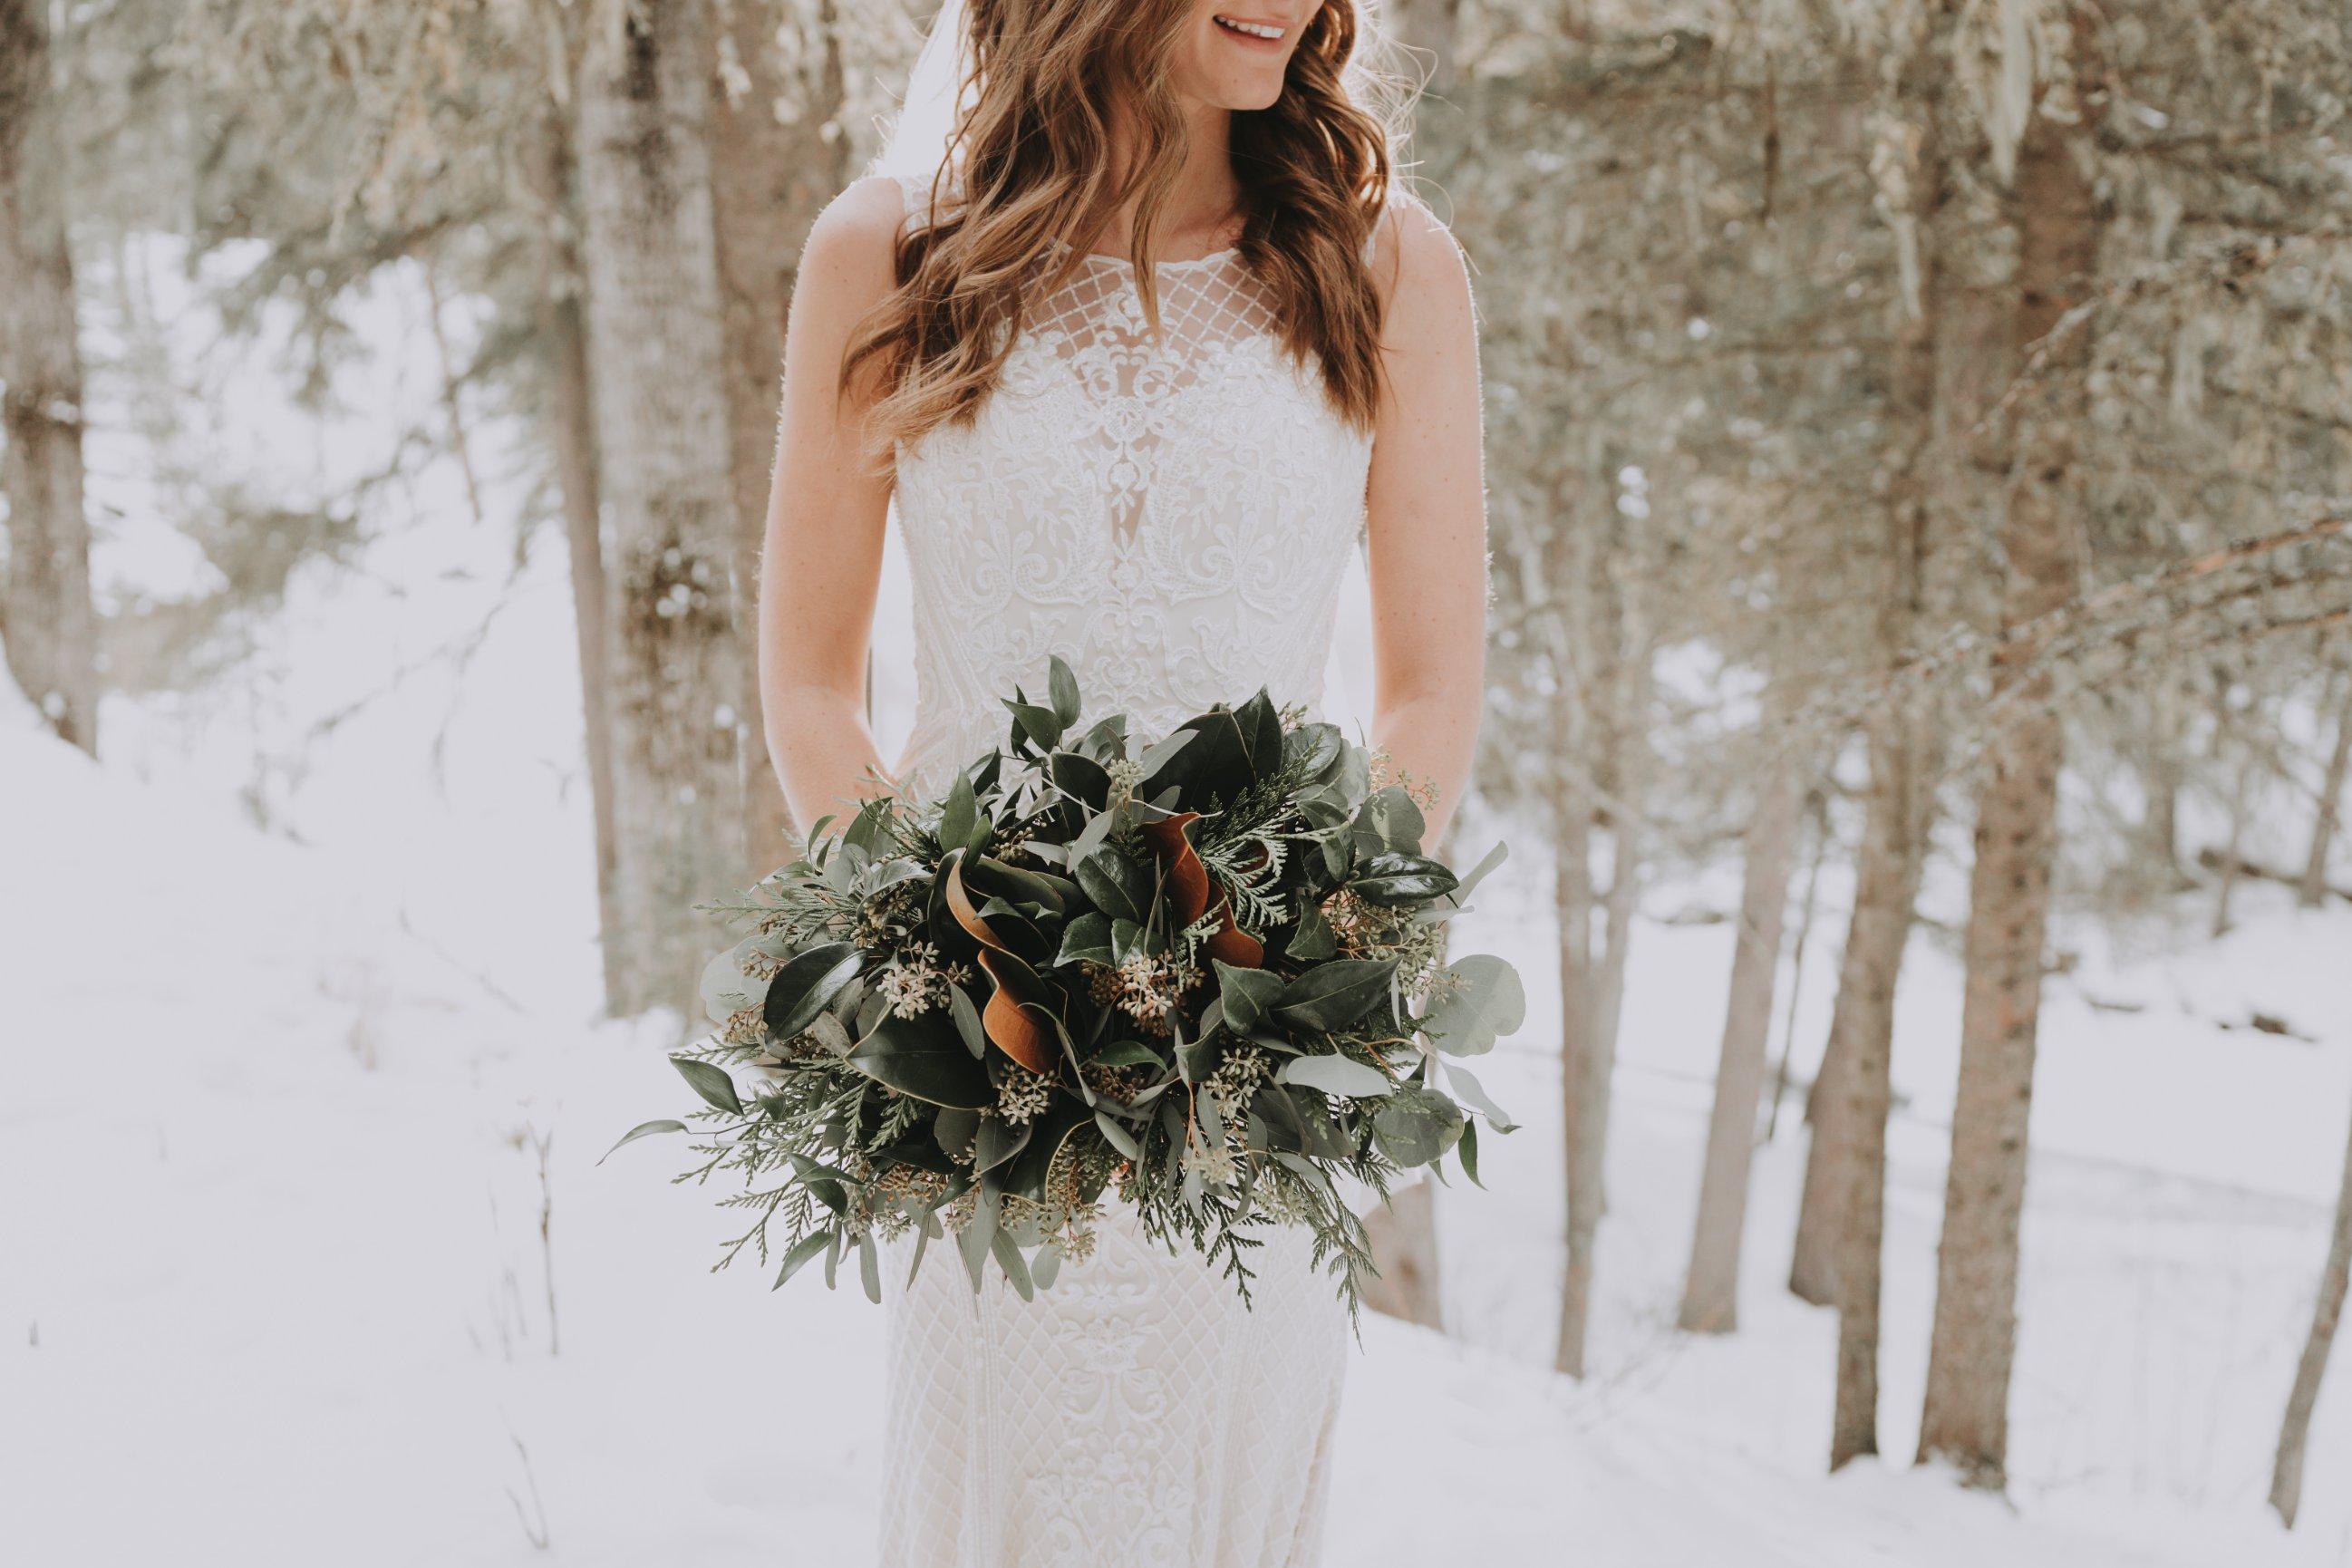 Winter Bridal Bouquets